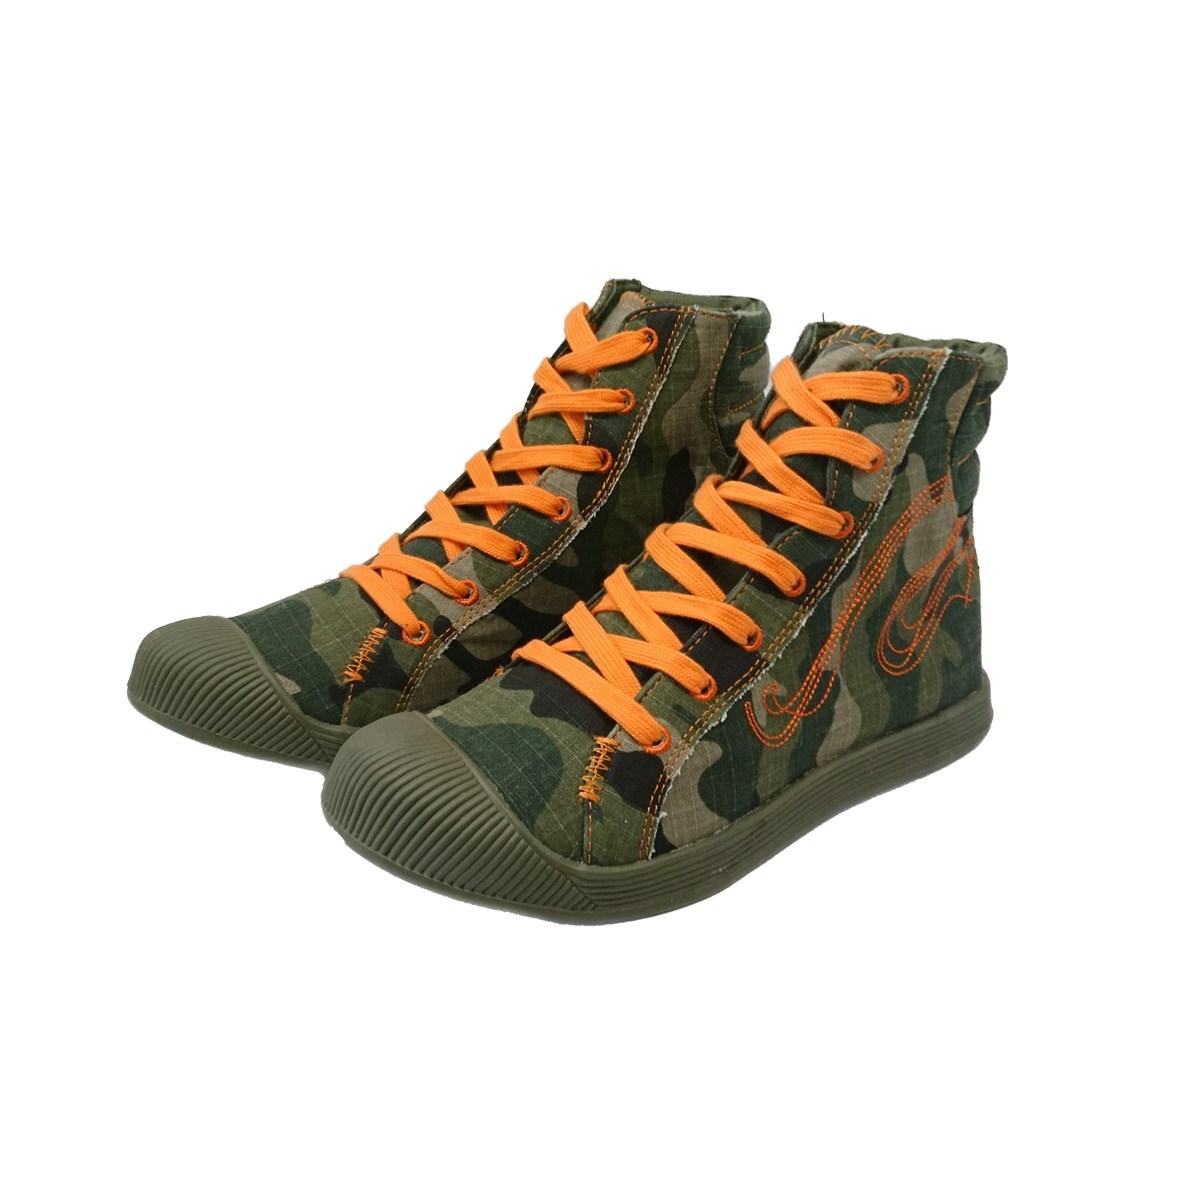 Sneaker πάνινο exe 7987 Khaki